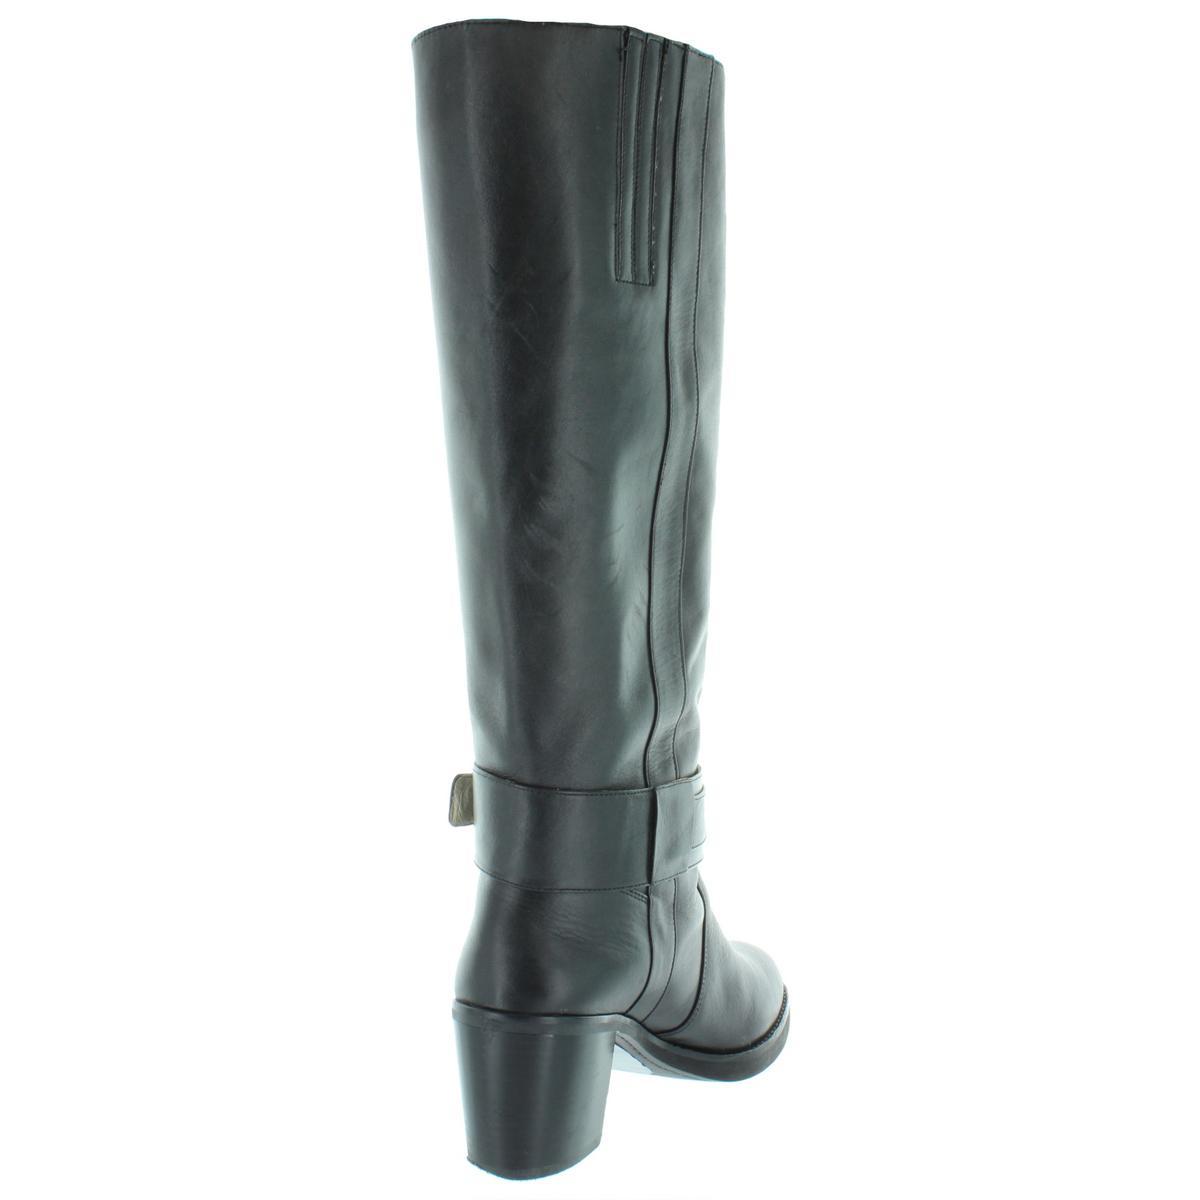 206f927242b6e MICHAEL Michael Kors Womens Black Knee-High Boots Shoes 8 Medium (B ...